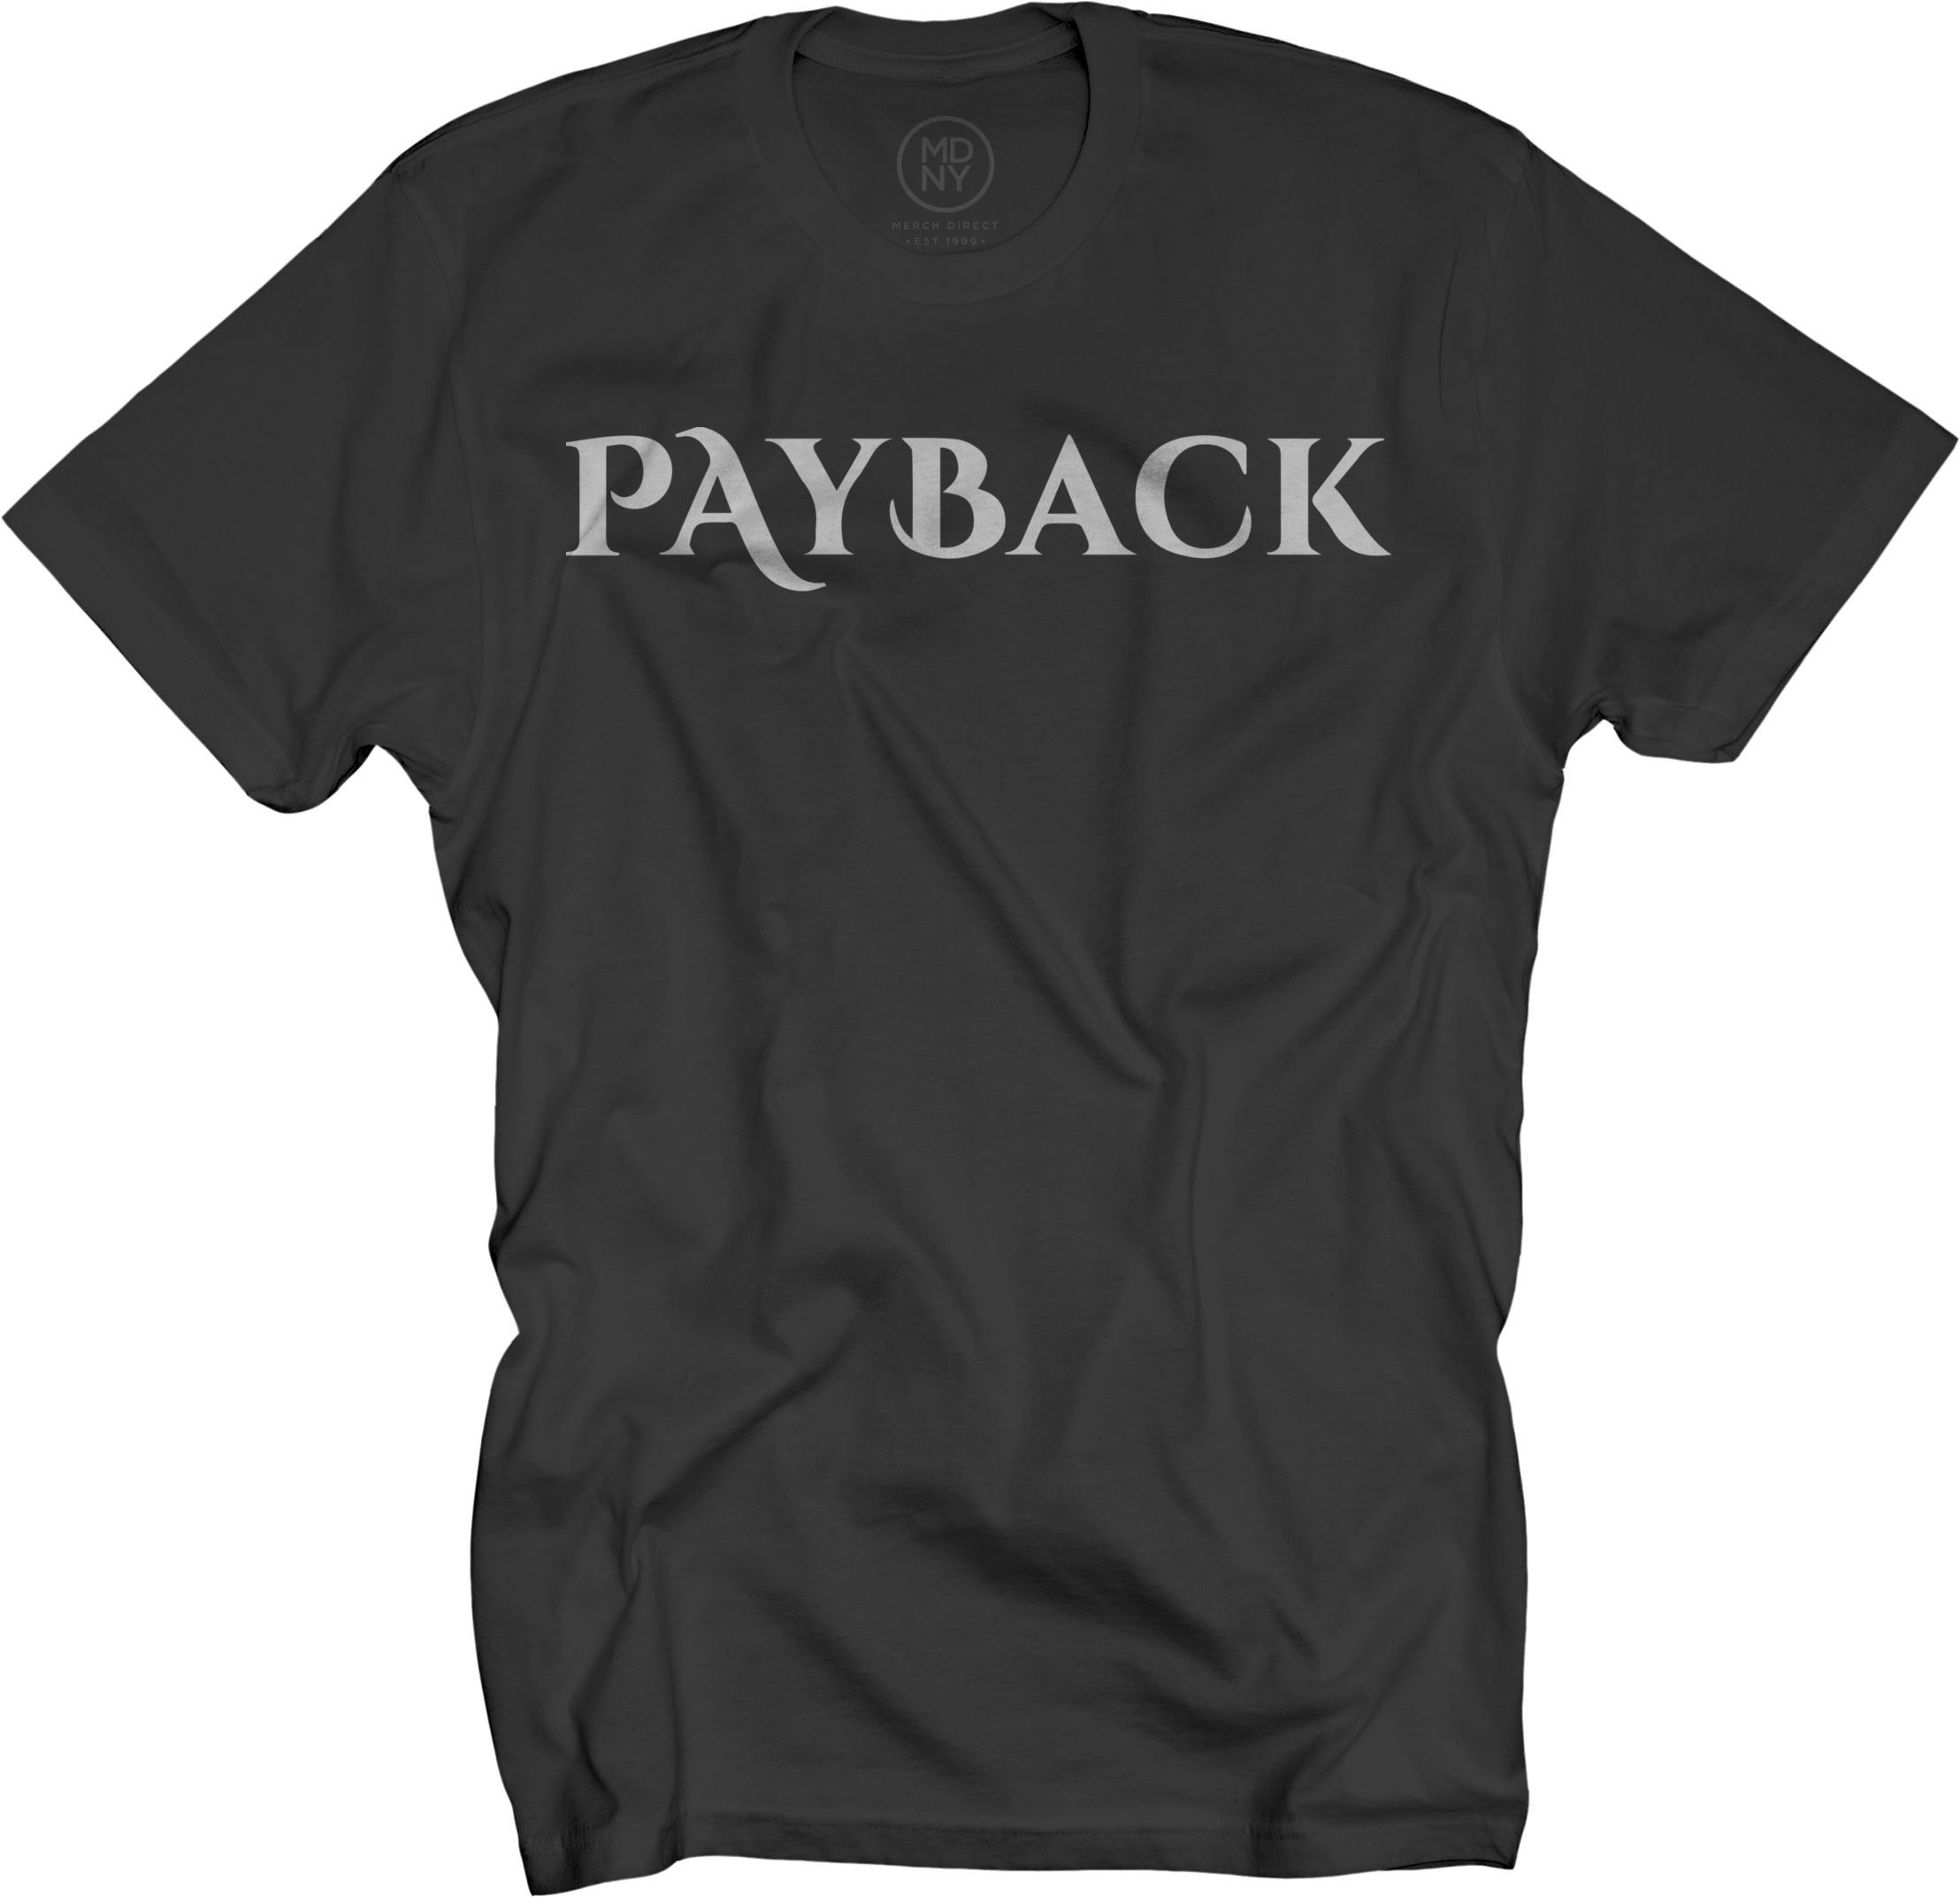 Payback Black T-Shirt